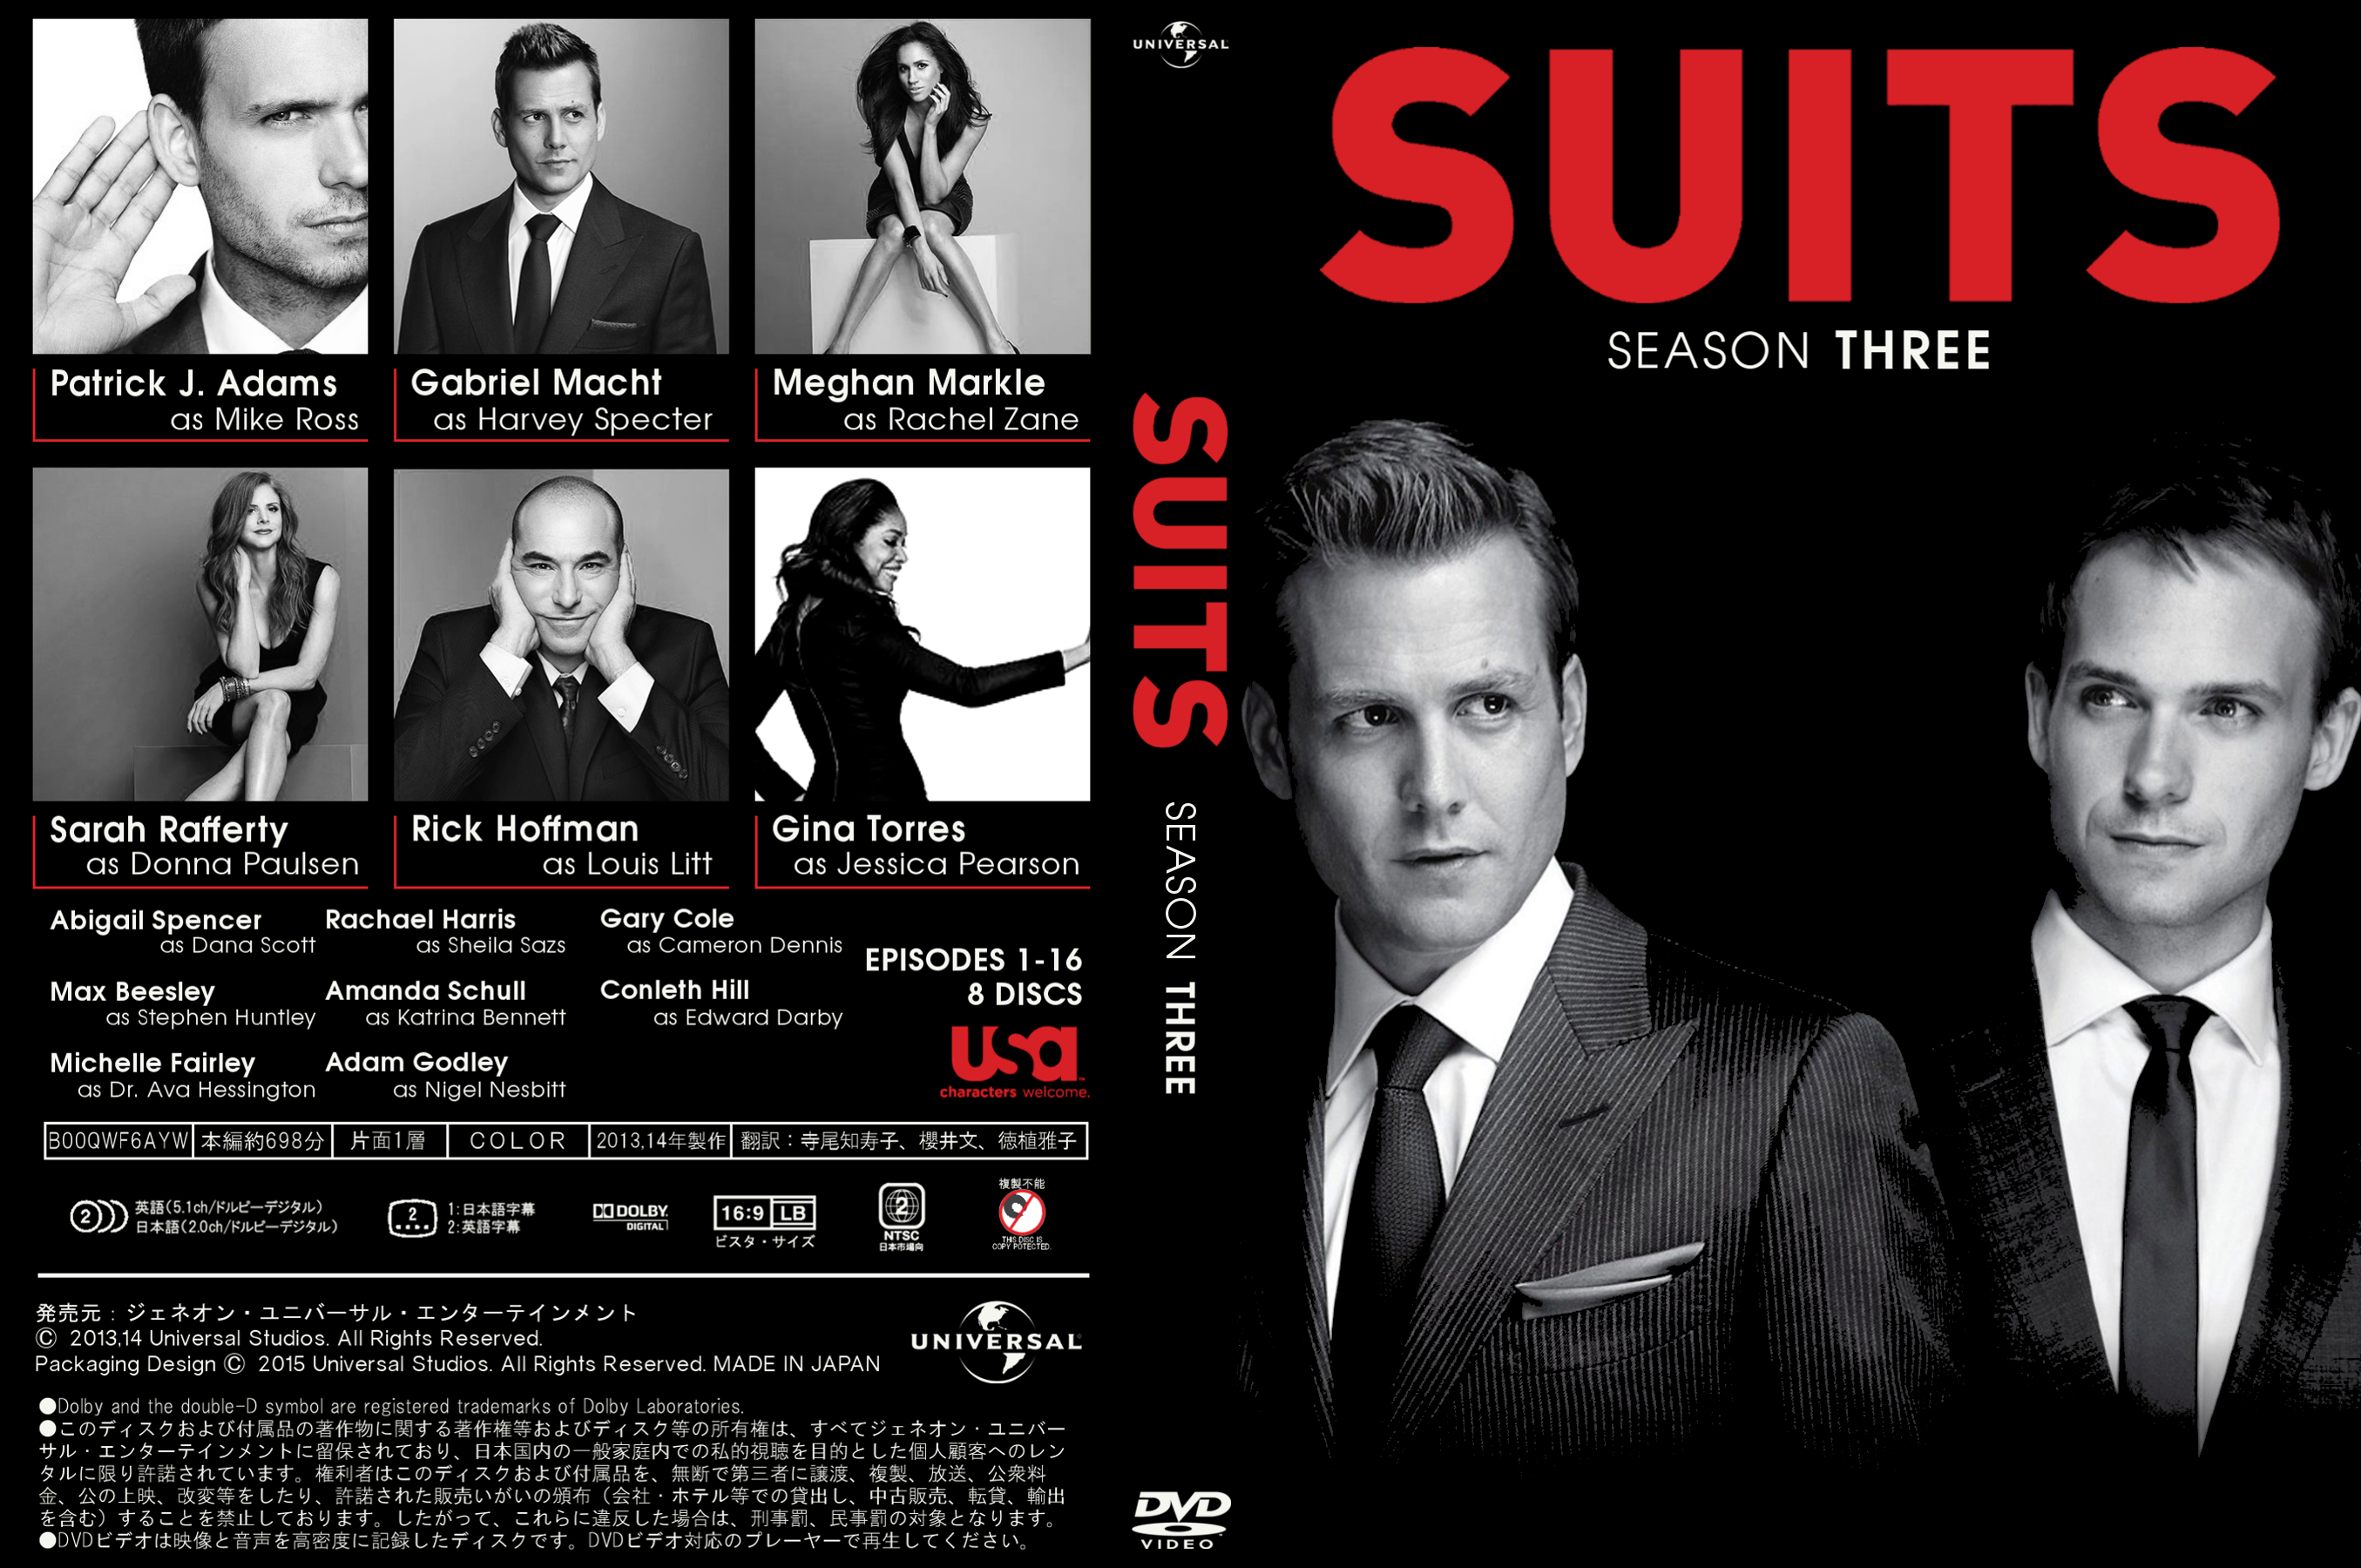 Fztv suits season 3